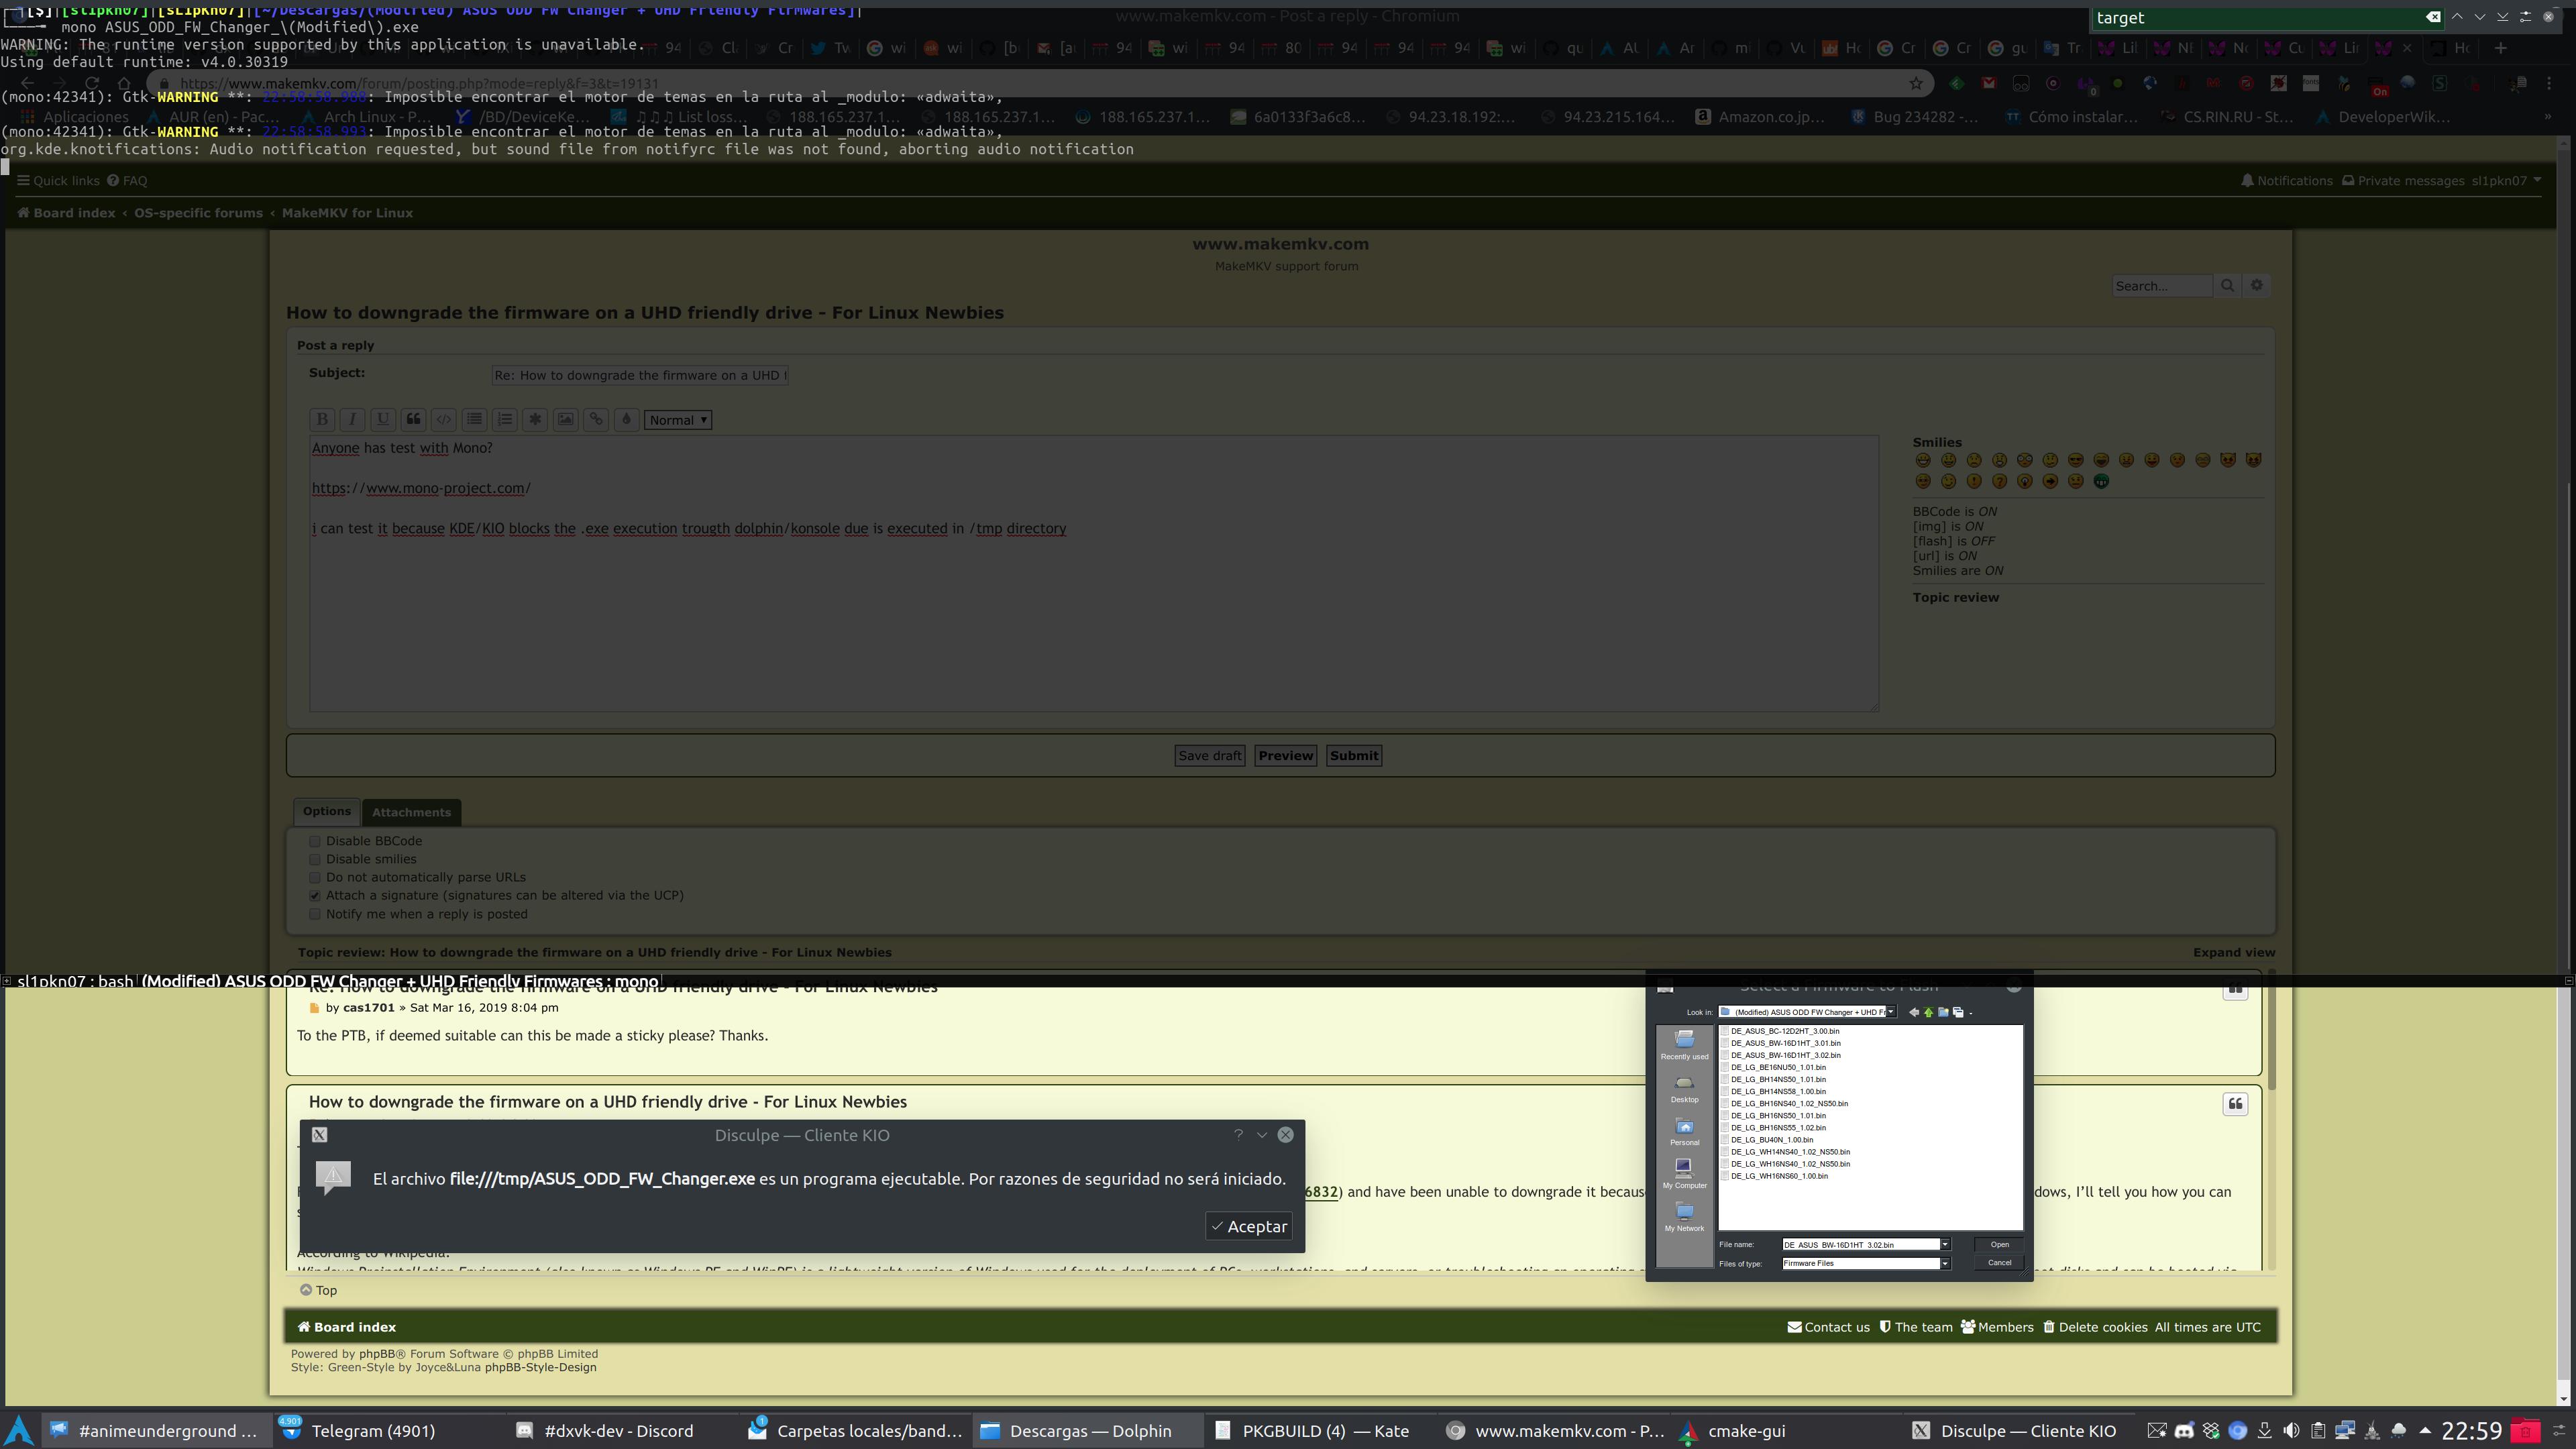 NEW OPTION: 'UHD Friendly' Firmware Downgrade / Cross-Flash Using